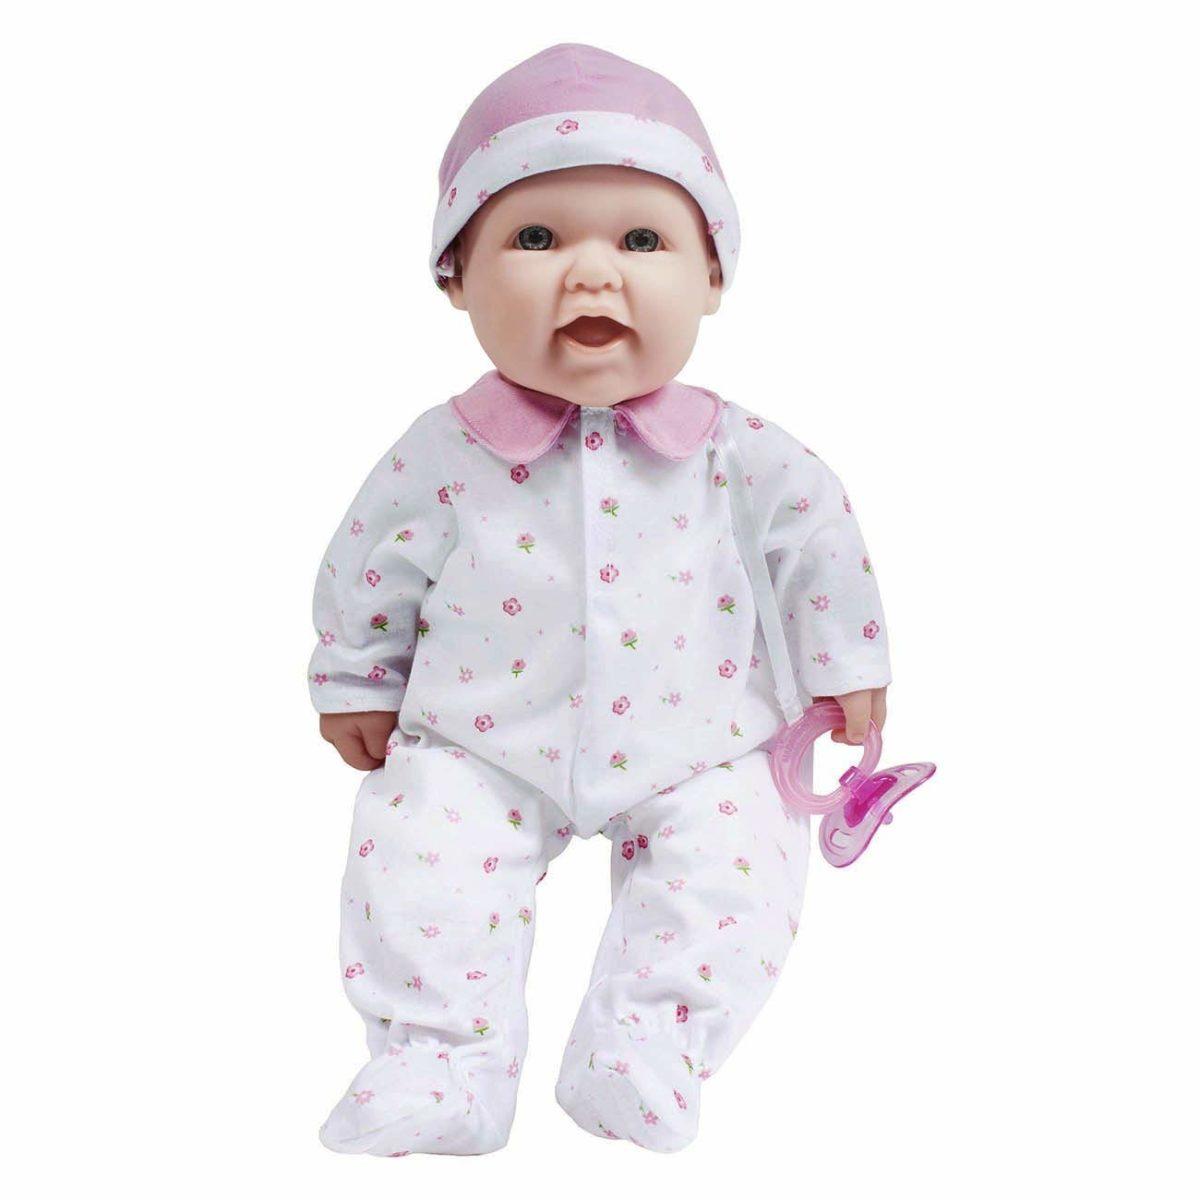 life-like baby dolls